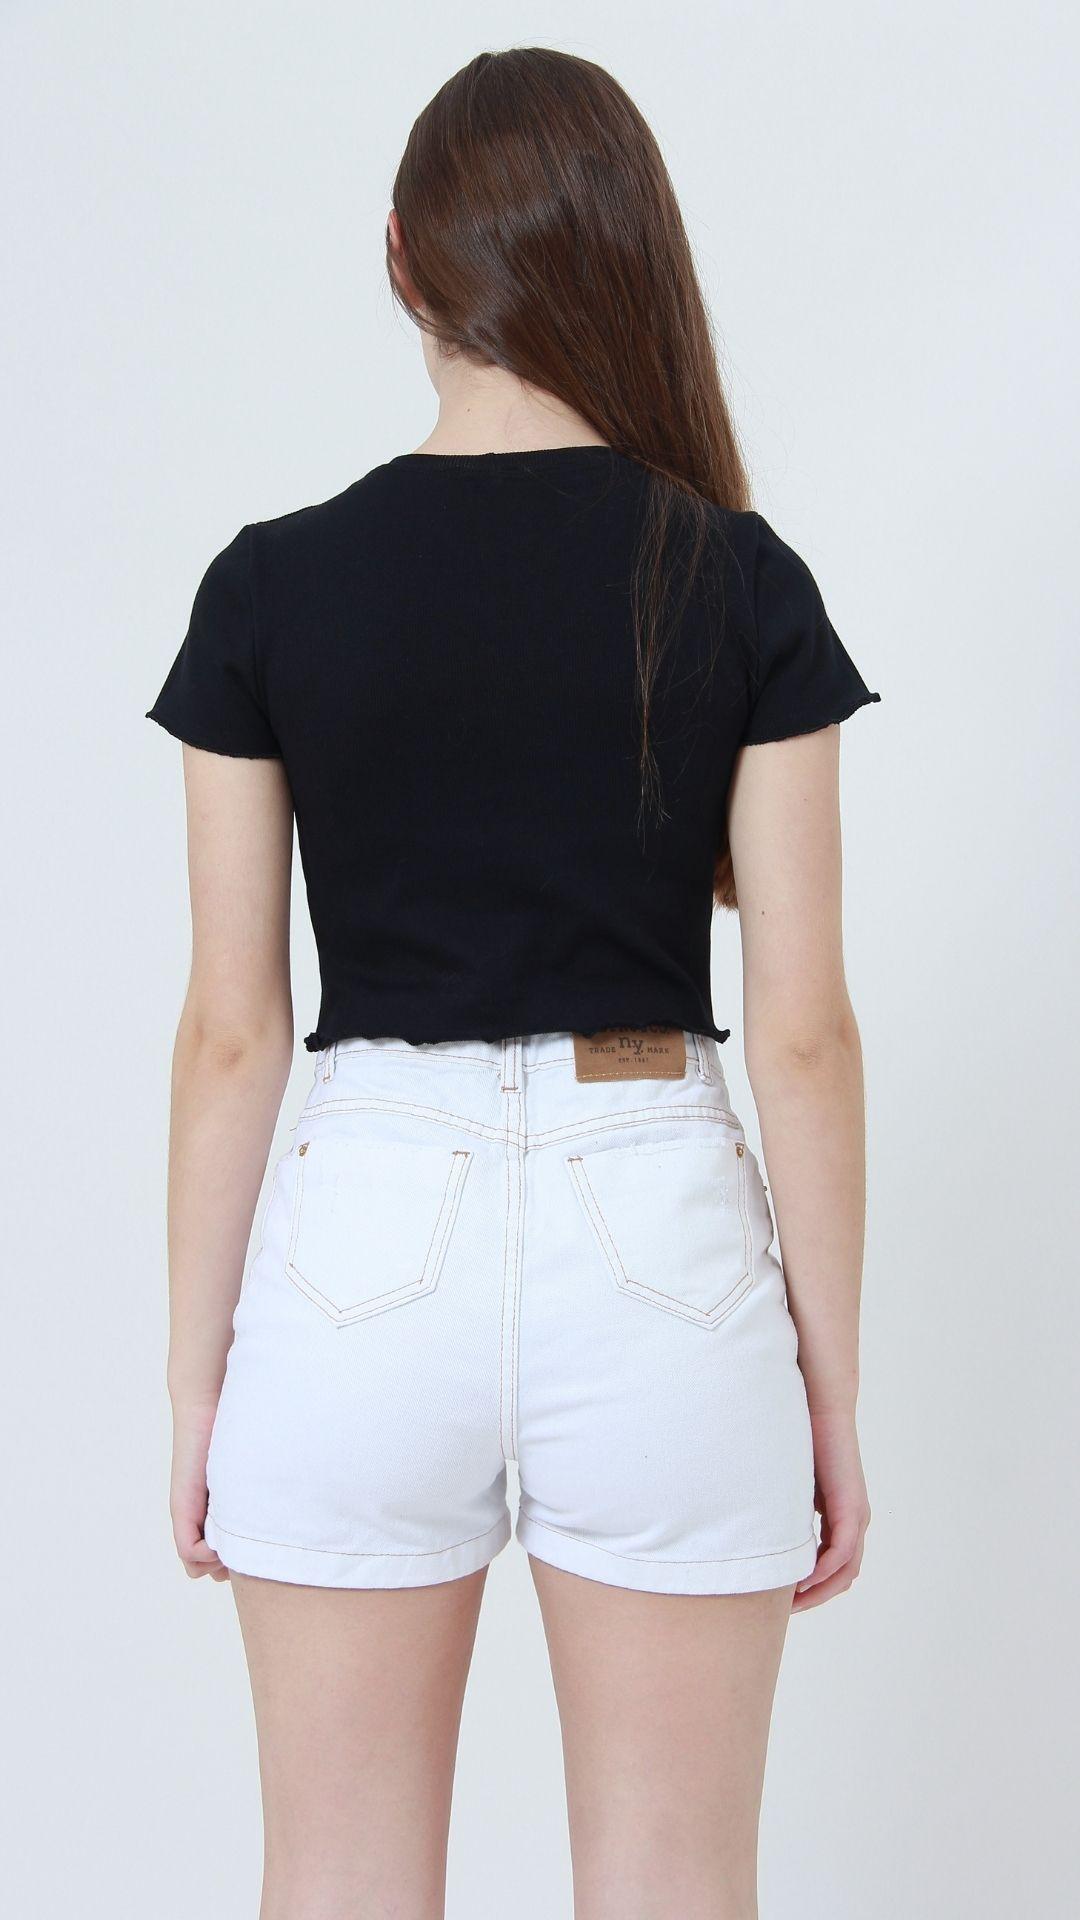 T-shirt Ribbed Frills Preto  - Metro & Co.